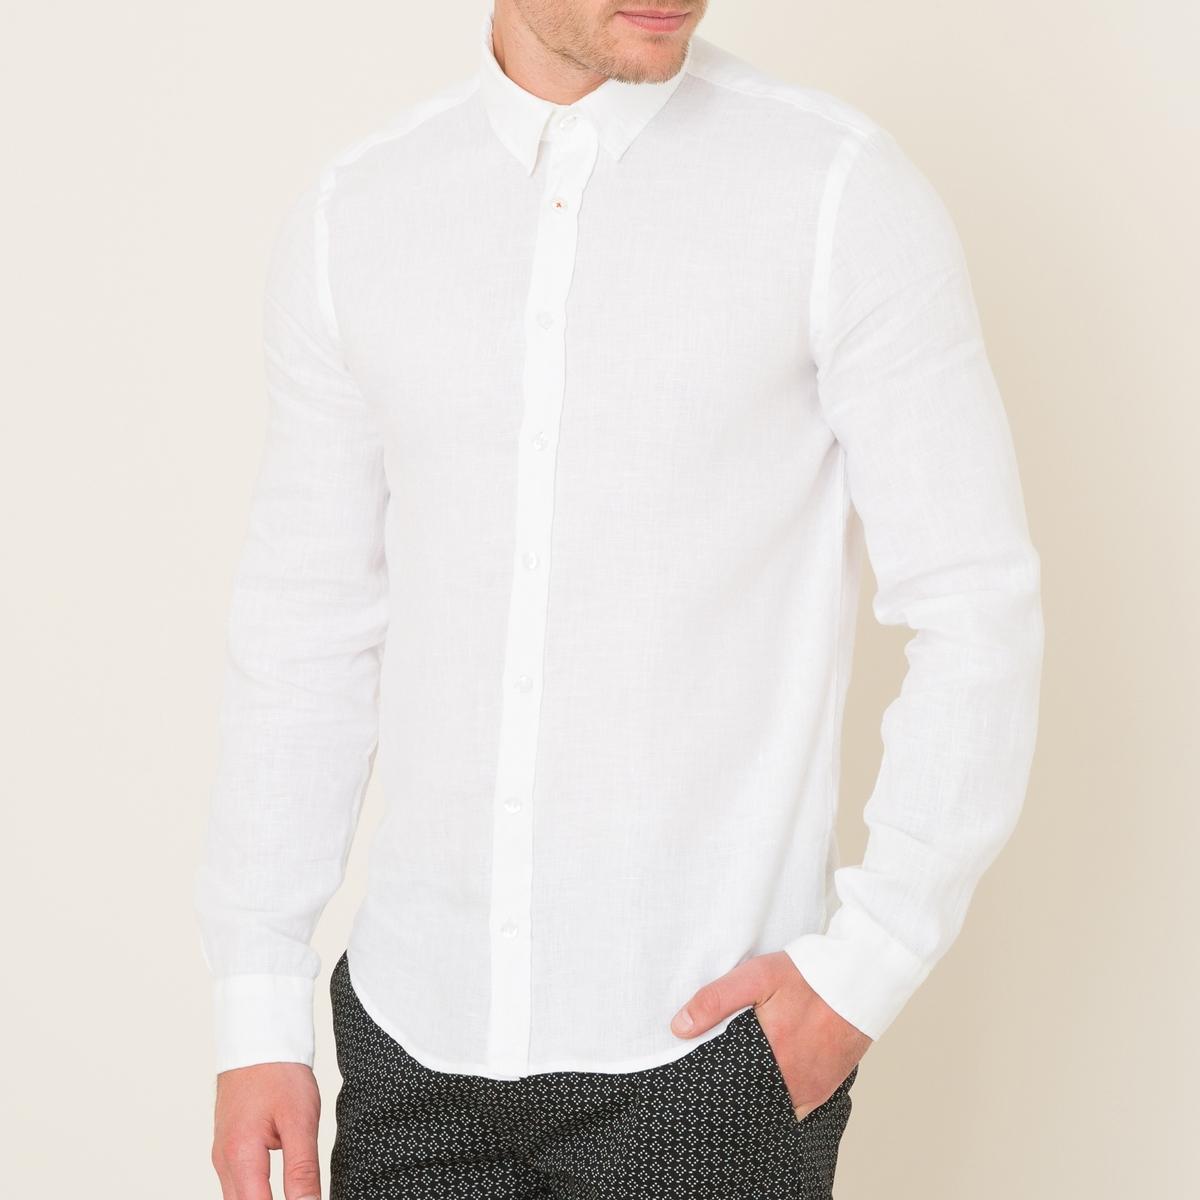 Рубашка льняная FORBANСостав и описание Материал : 100% ленМарка : HARRIS WILSON<br><br>Цвет: белый,хаки<br>Размер: M.M